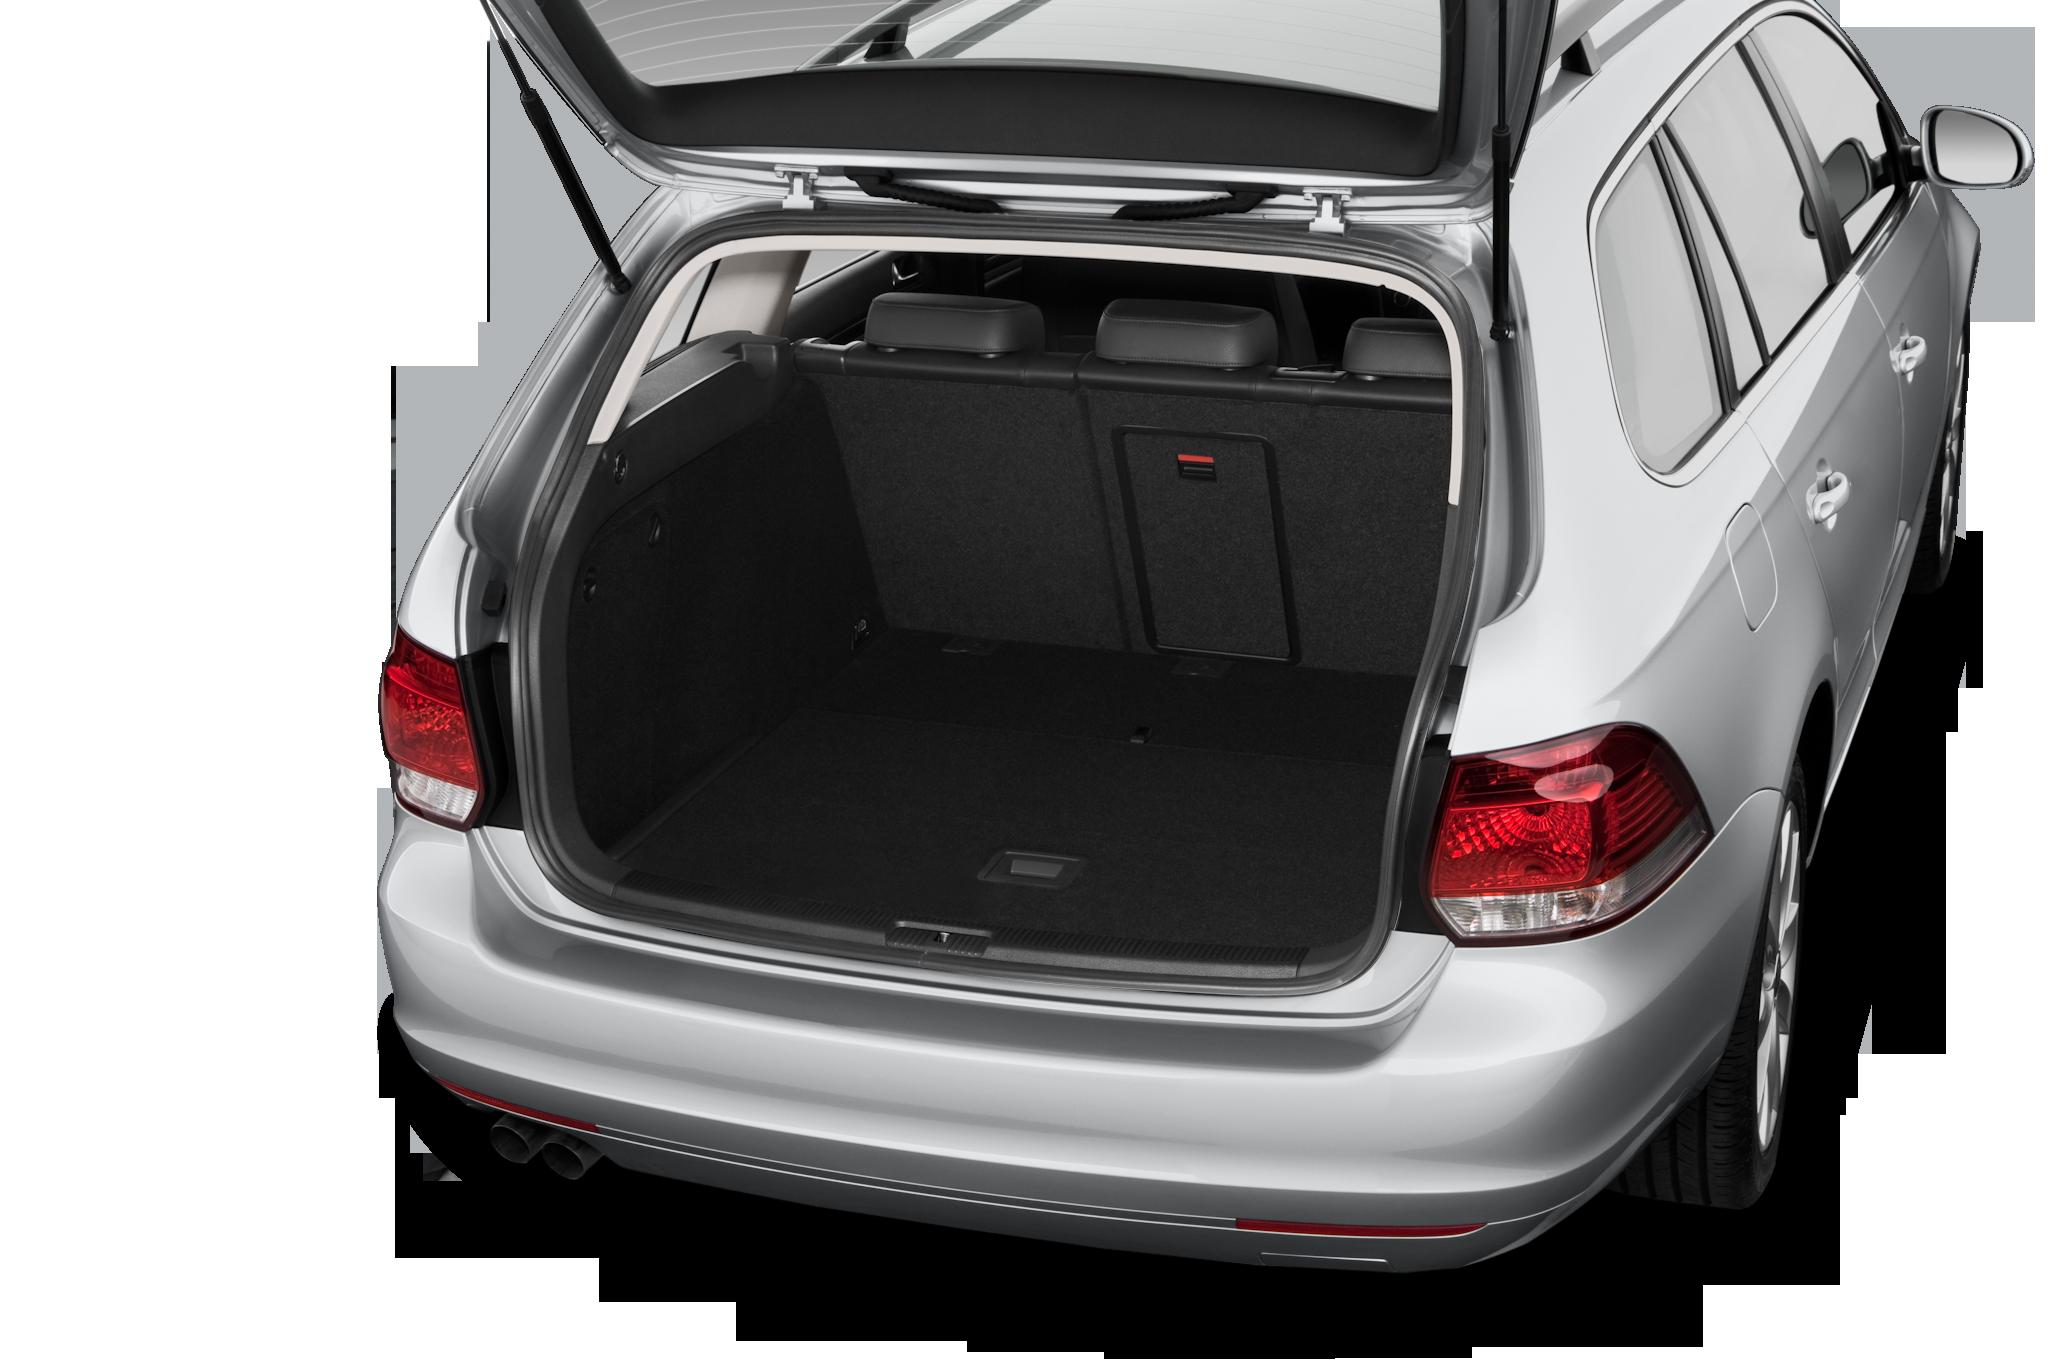 2010 Volkswagen Jetta Sportwagen Tdi Vw Midsize Sports Wagon Sedan 9 100